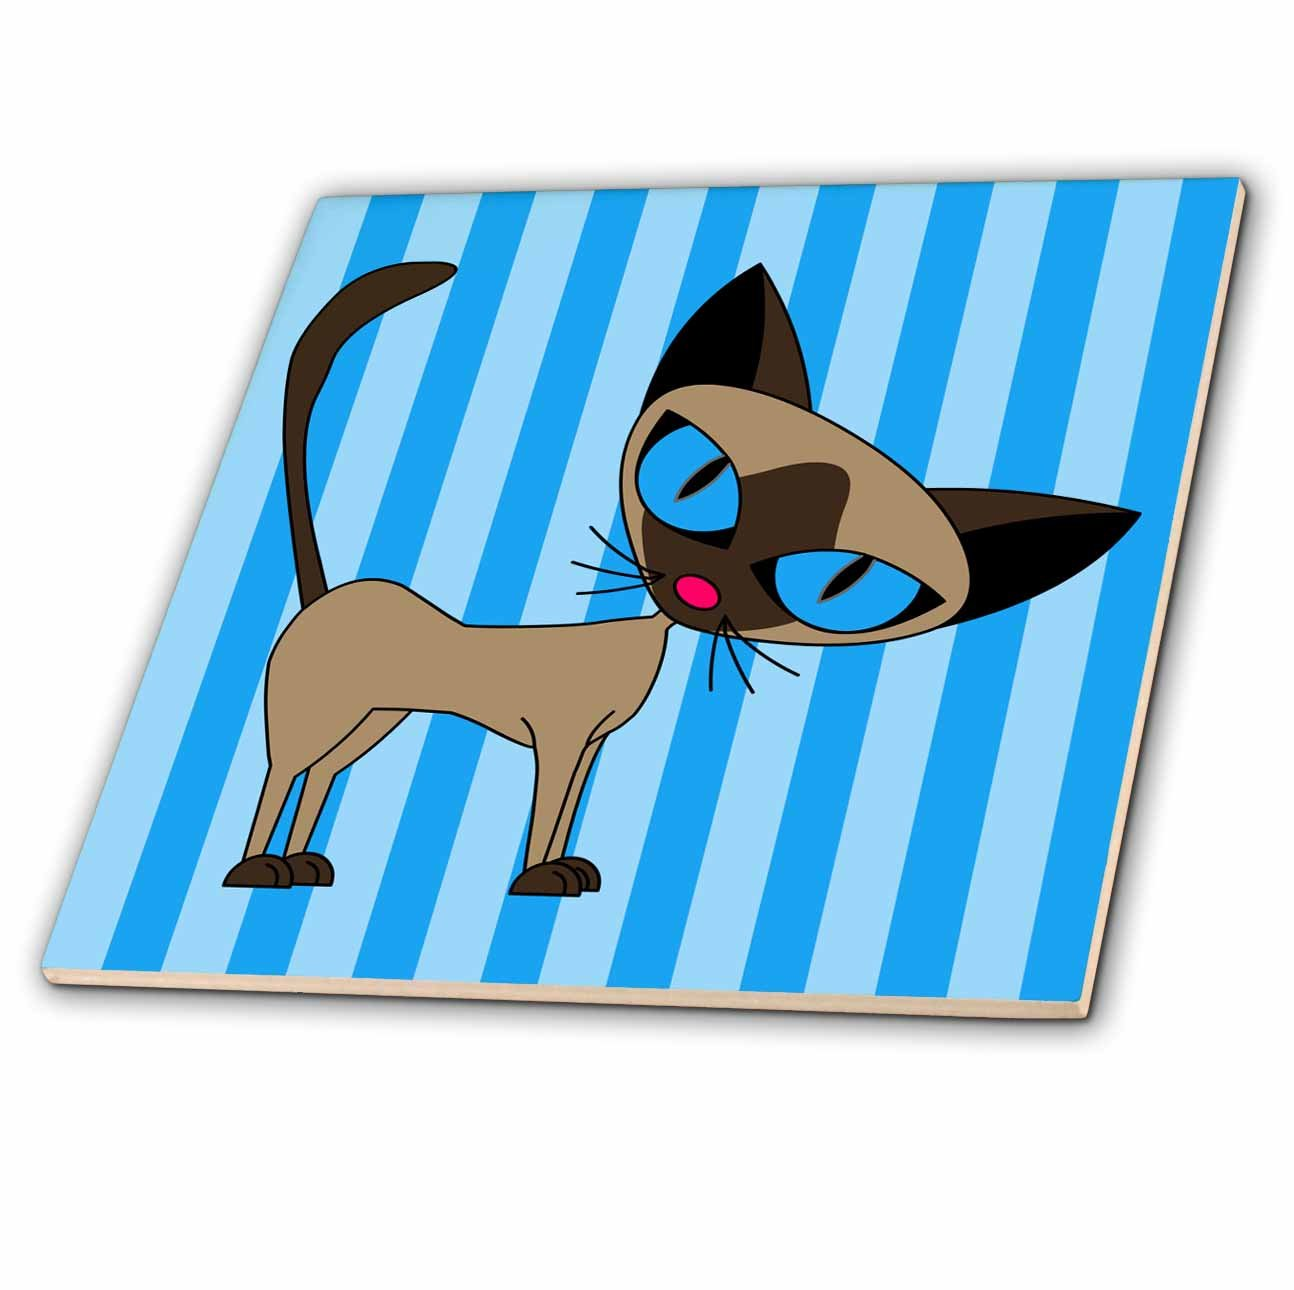 ct/_6167/_2 6 Inch Ceramic Tile Cute Siamese Cat Design 3dRose Janna Salak Designs Cats